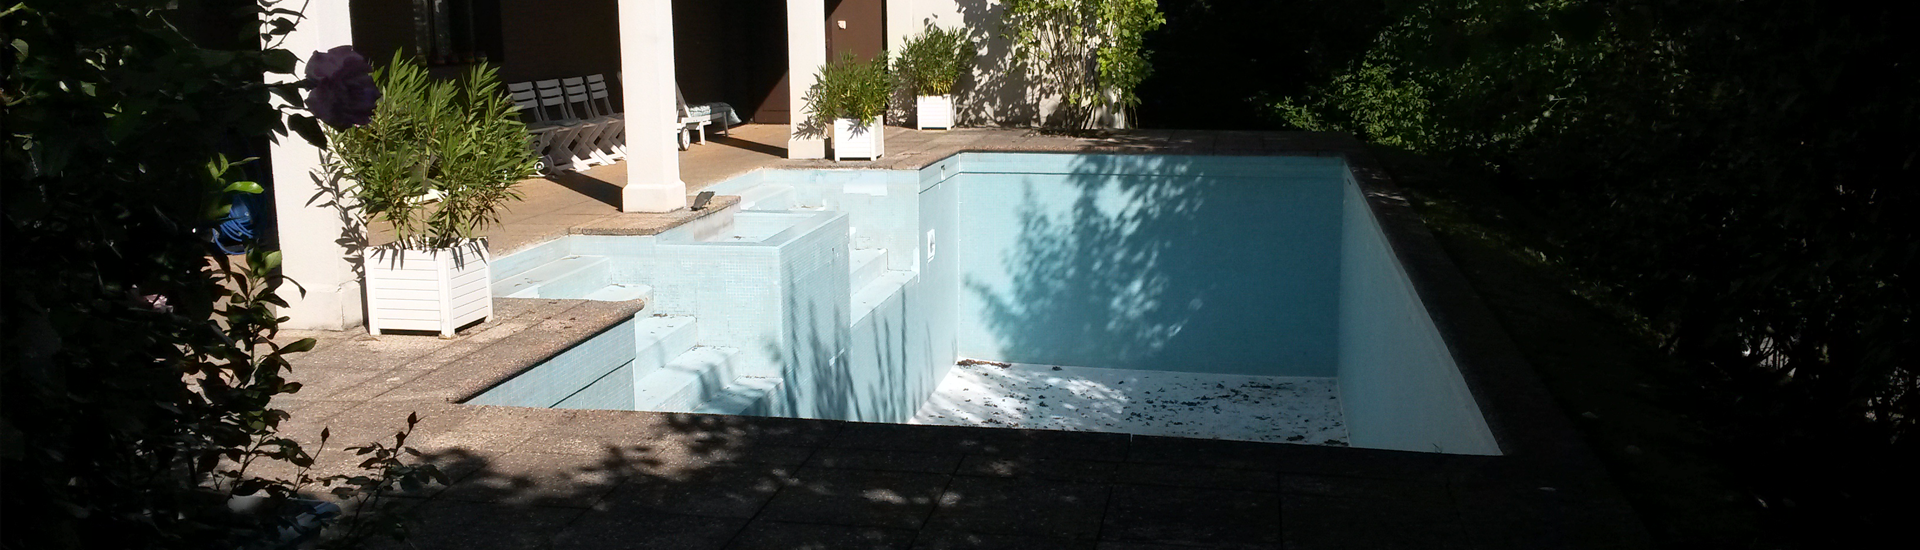 R novation de piscine en suisse for Renovation piscine